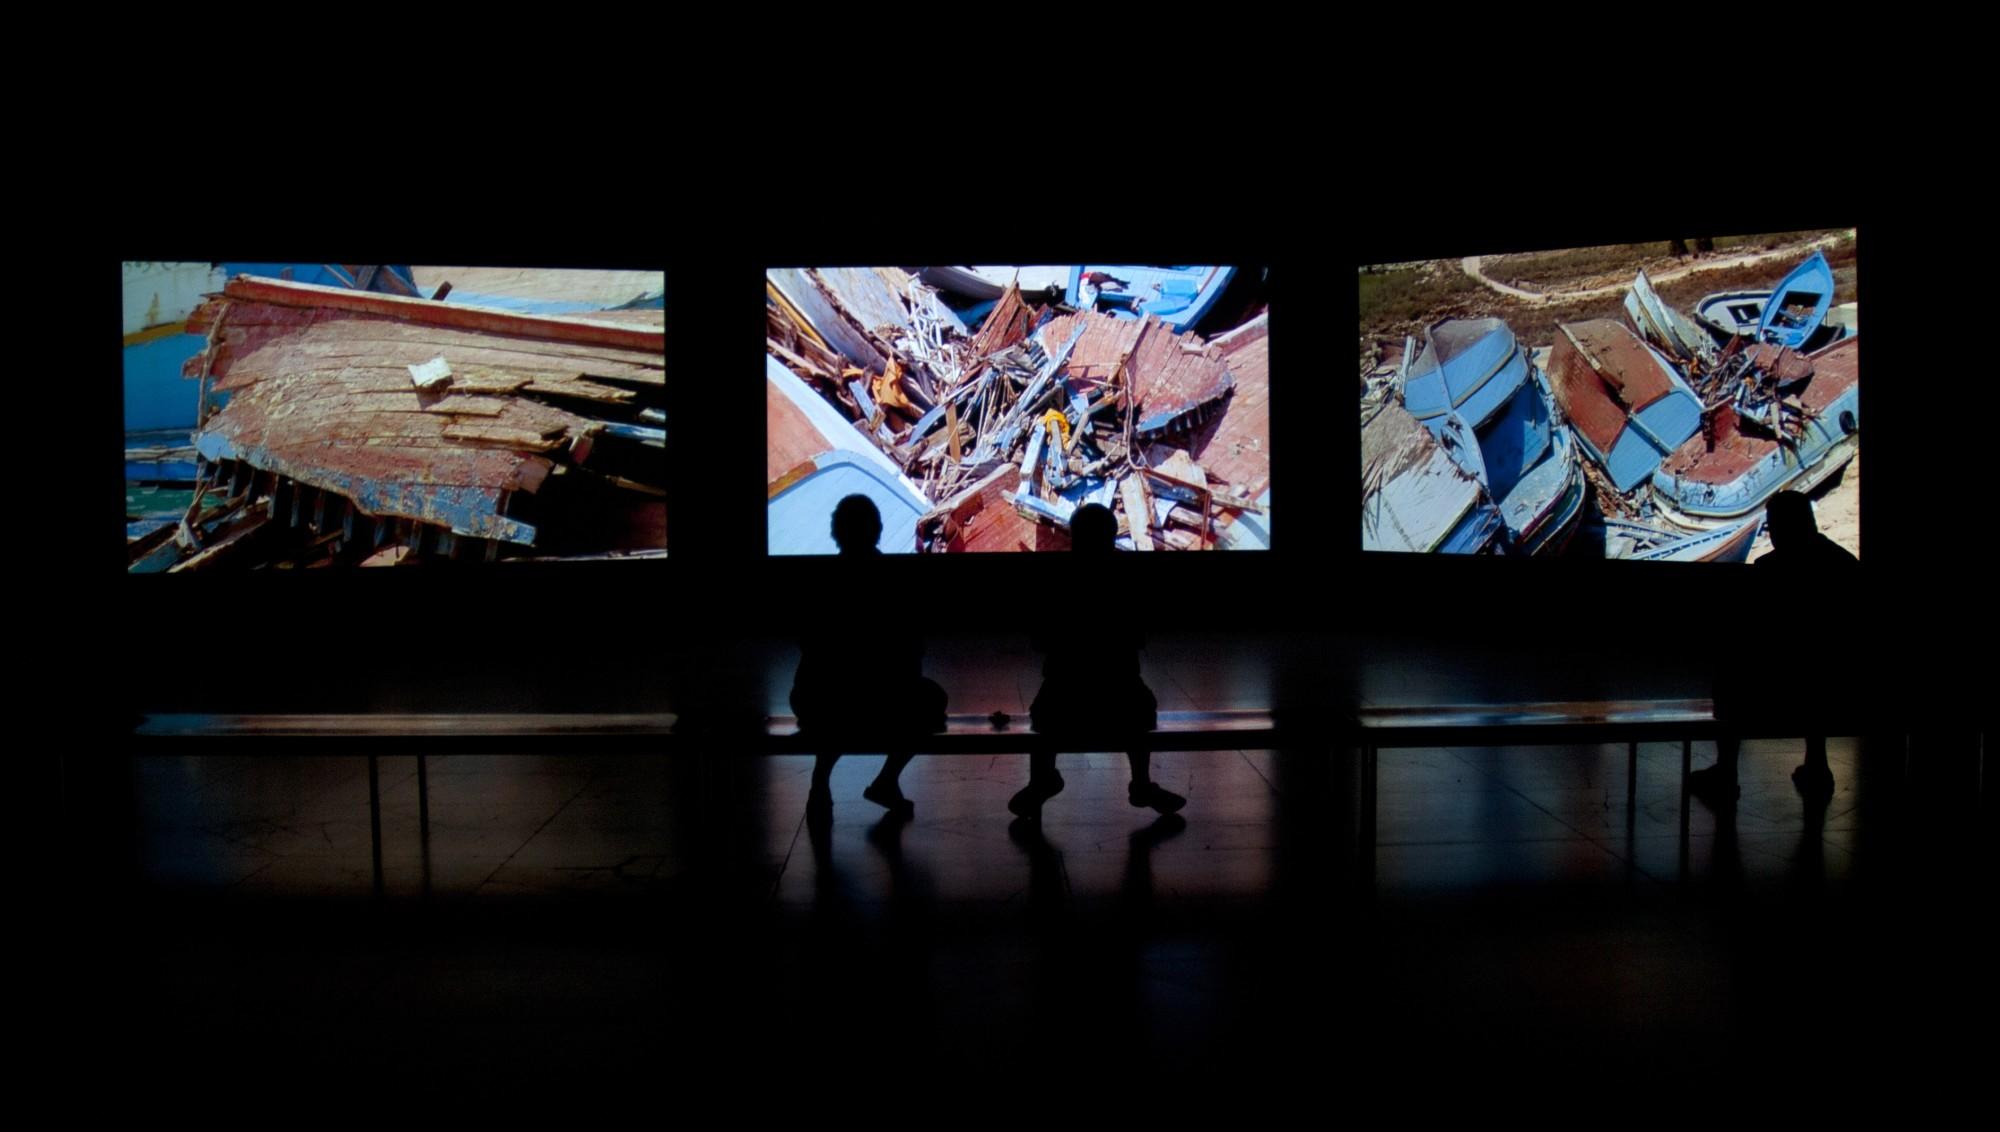 Videosphere: A New Generation. Albright-Knox Art Gallery, Buffalo, 2011